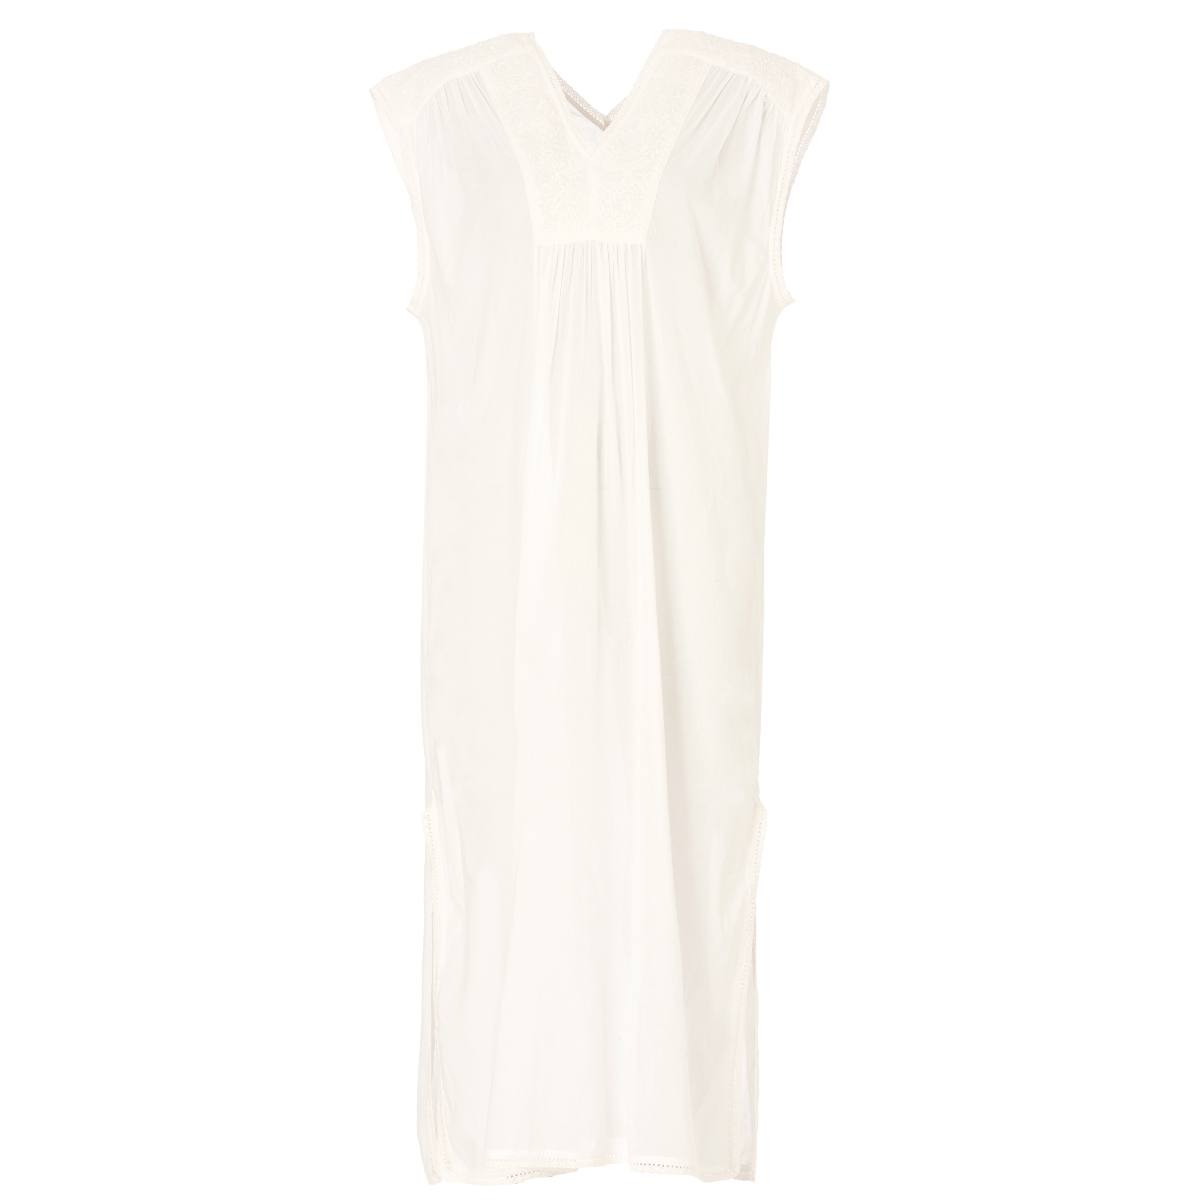 Arya Embroidered Long White Nightdress by M.A.B.E | Restoration Yard